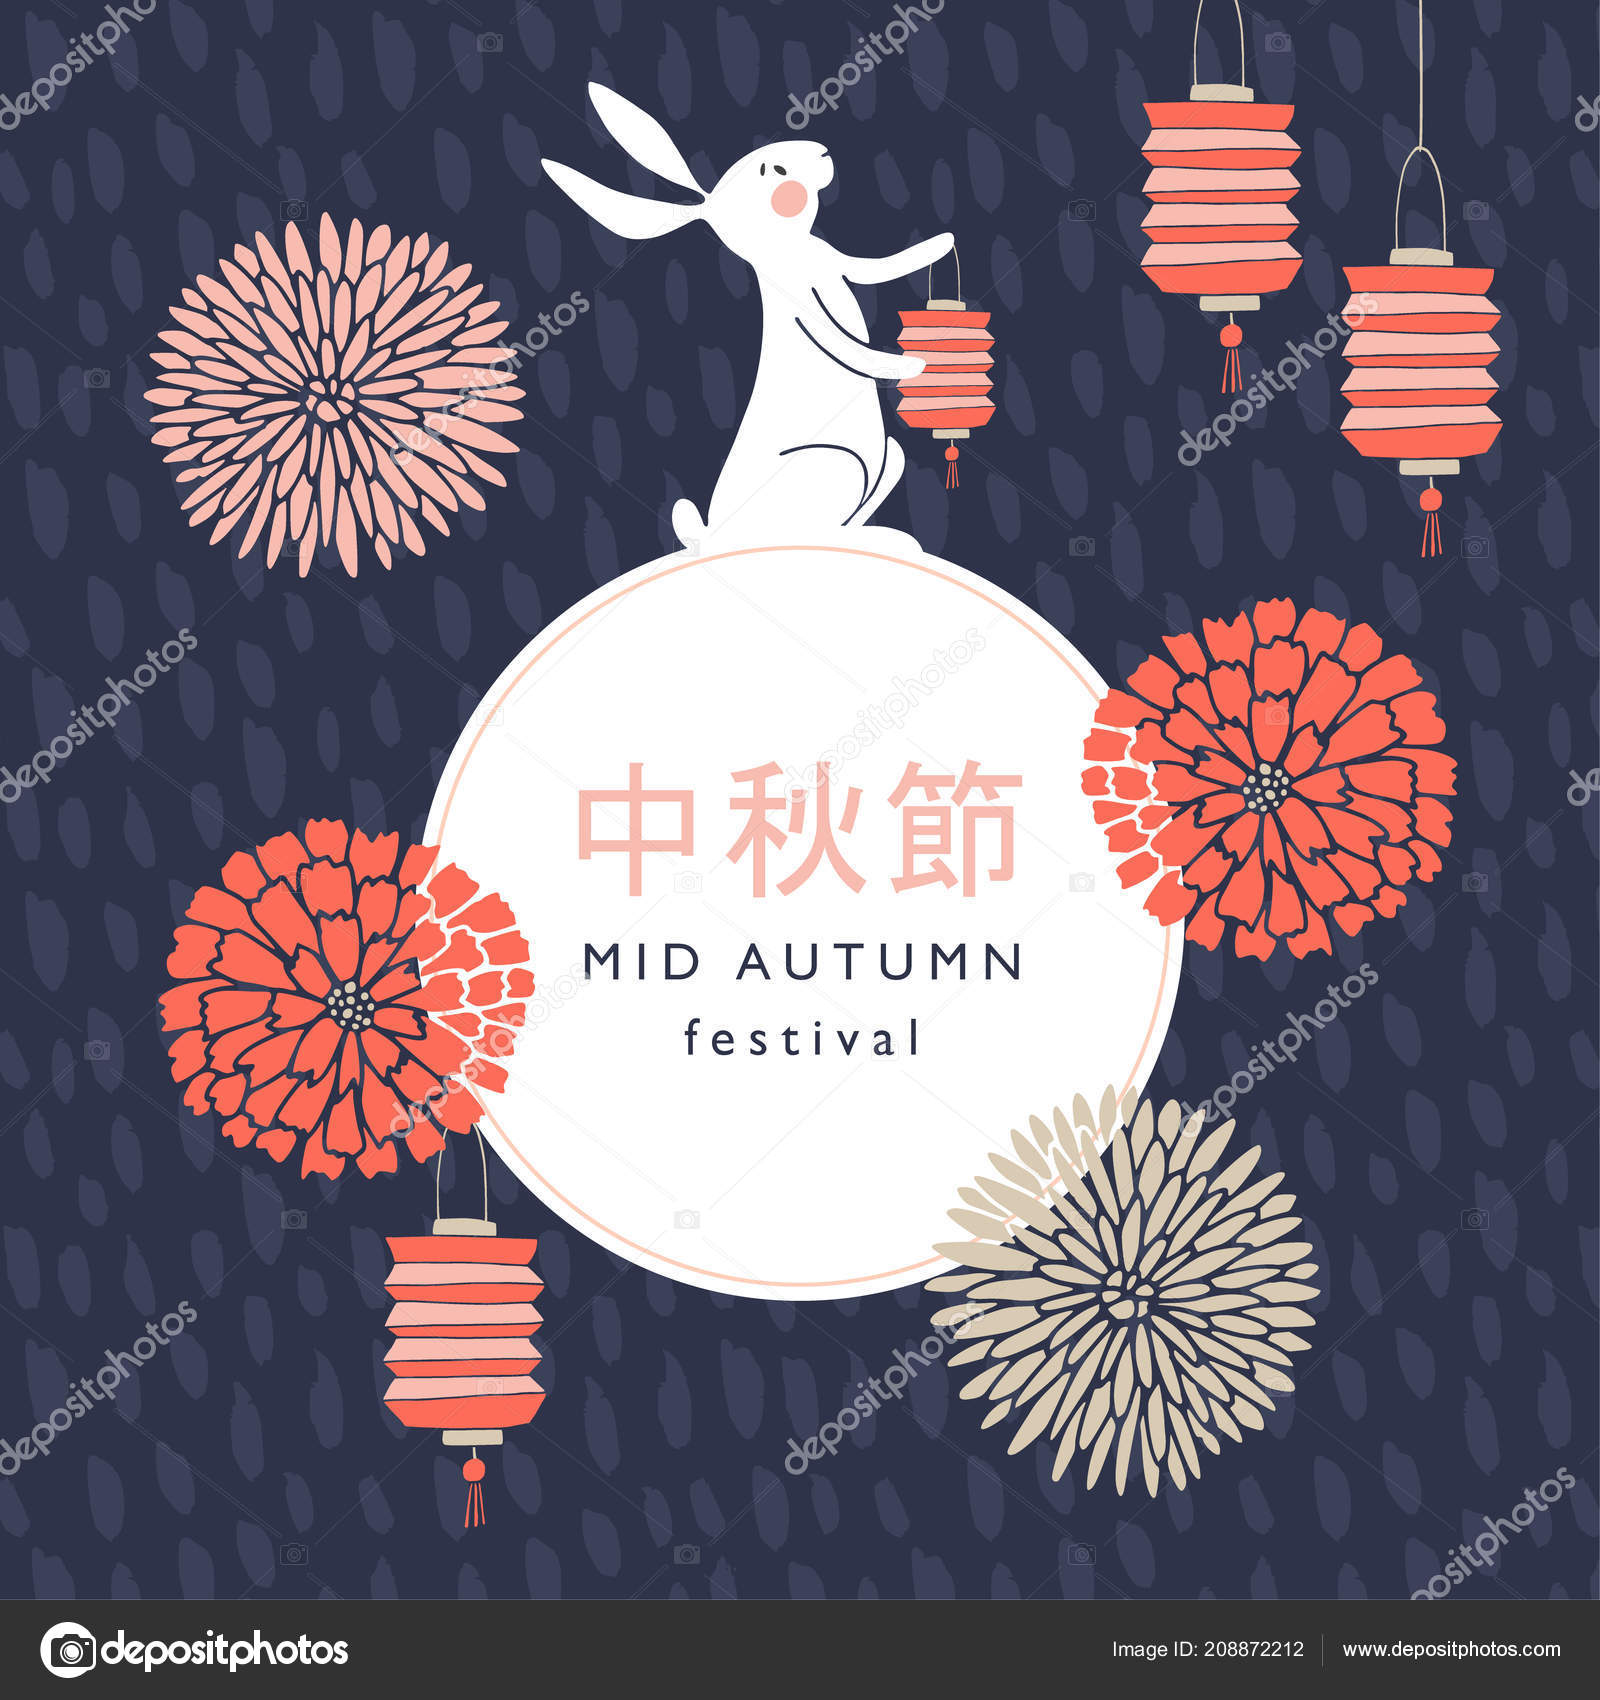 Mid autumn festival greeting card invitation with jade rabbit moon mid autumn festival greeting card invitation with jade rabbit moon silhouette chrysanthemum flowers m4hsunfo